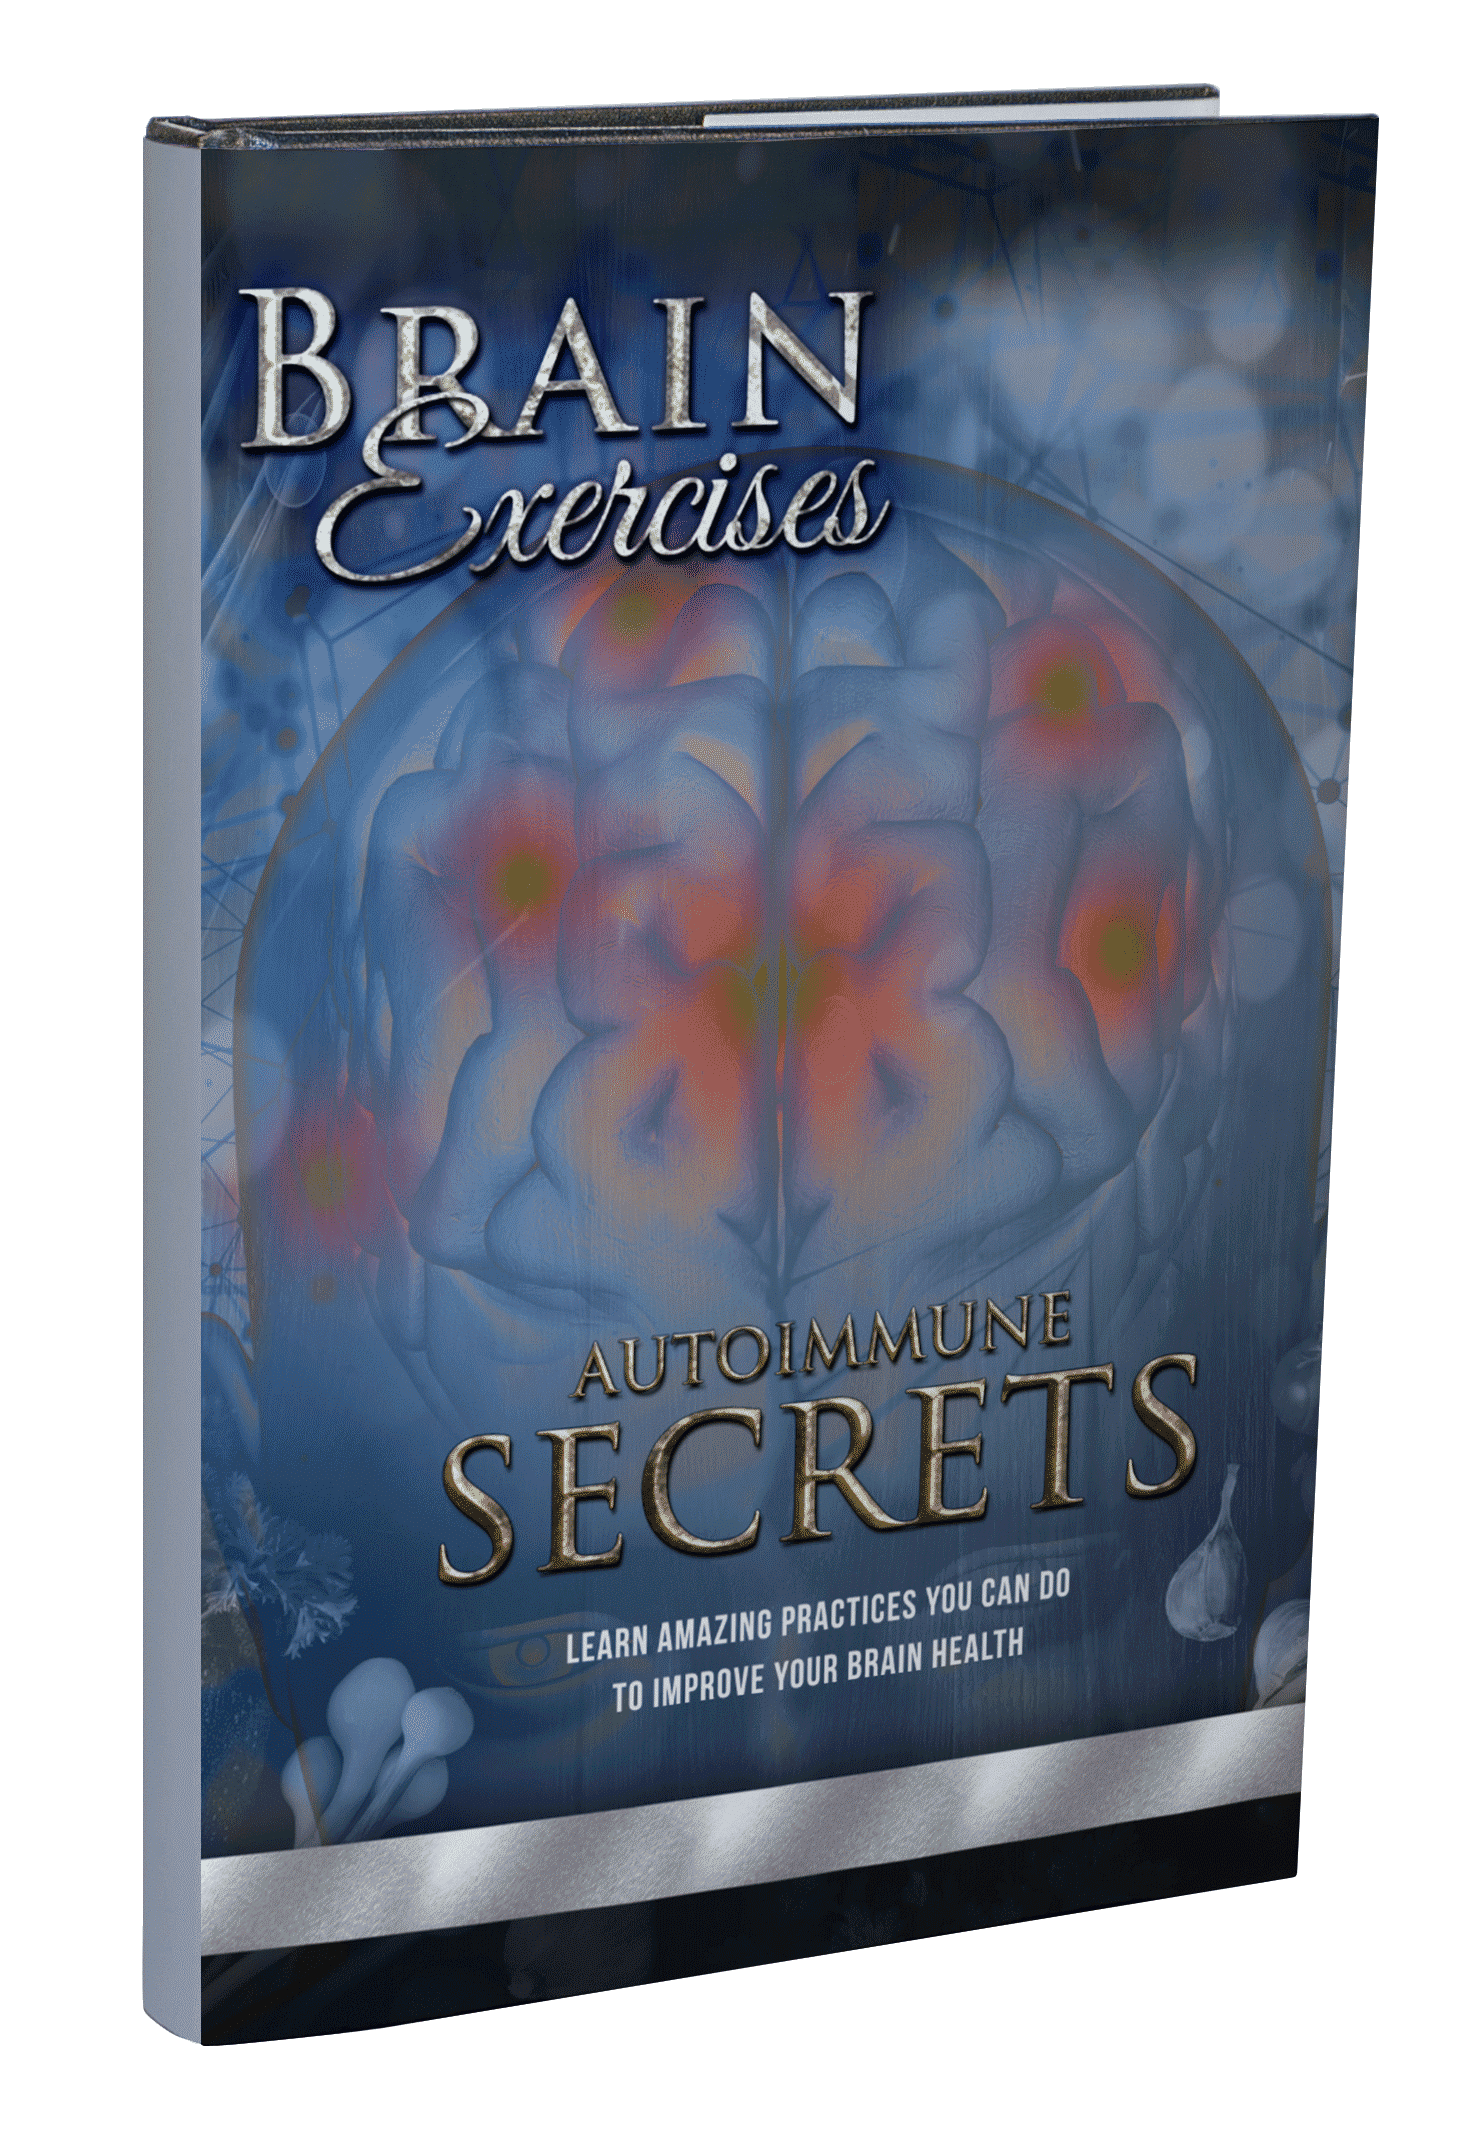 BrainExercises_Ebook_Cover